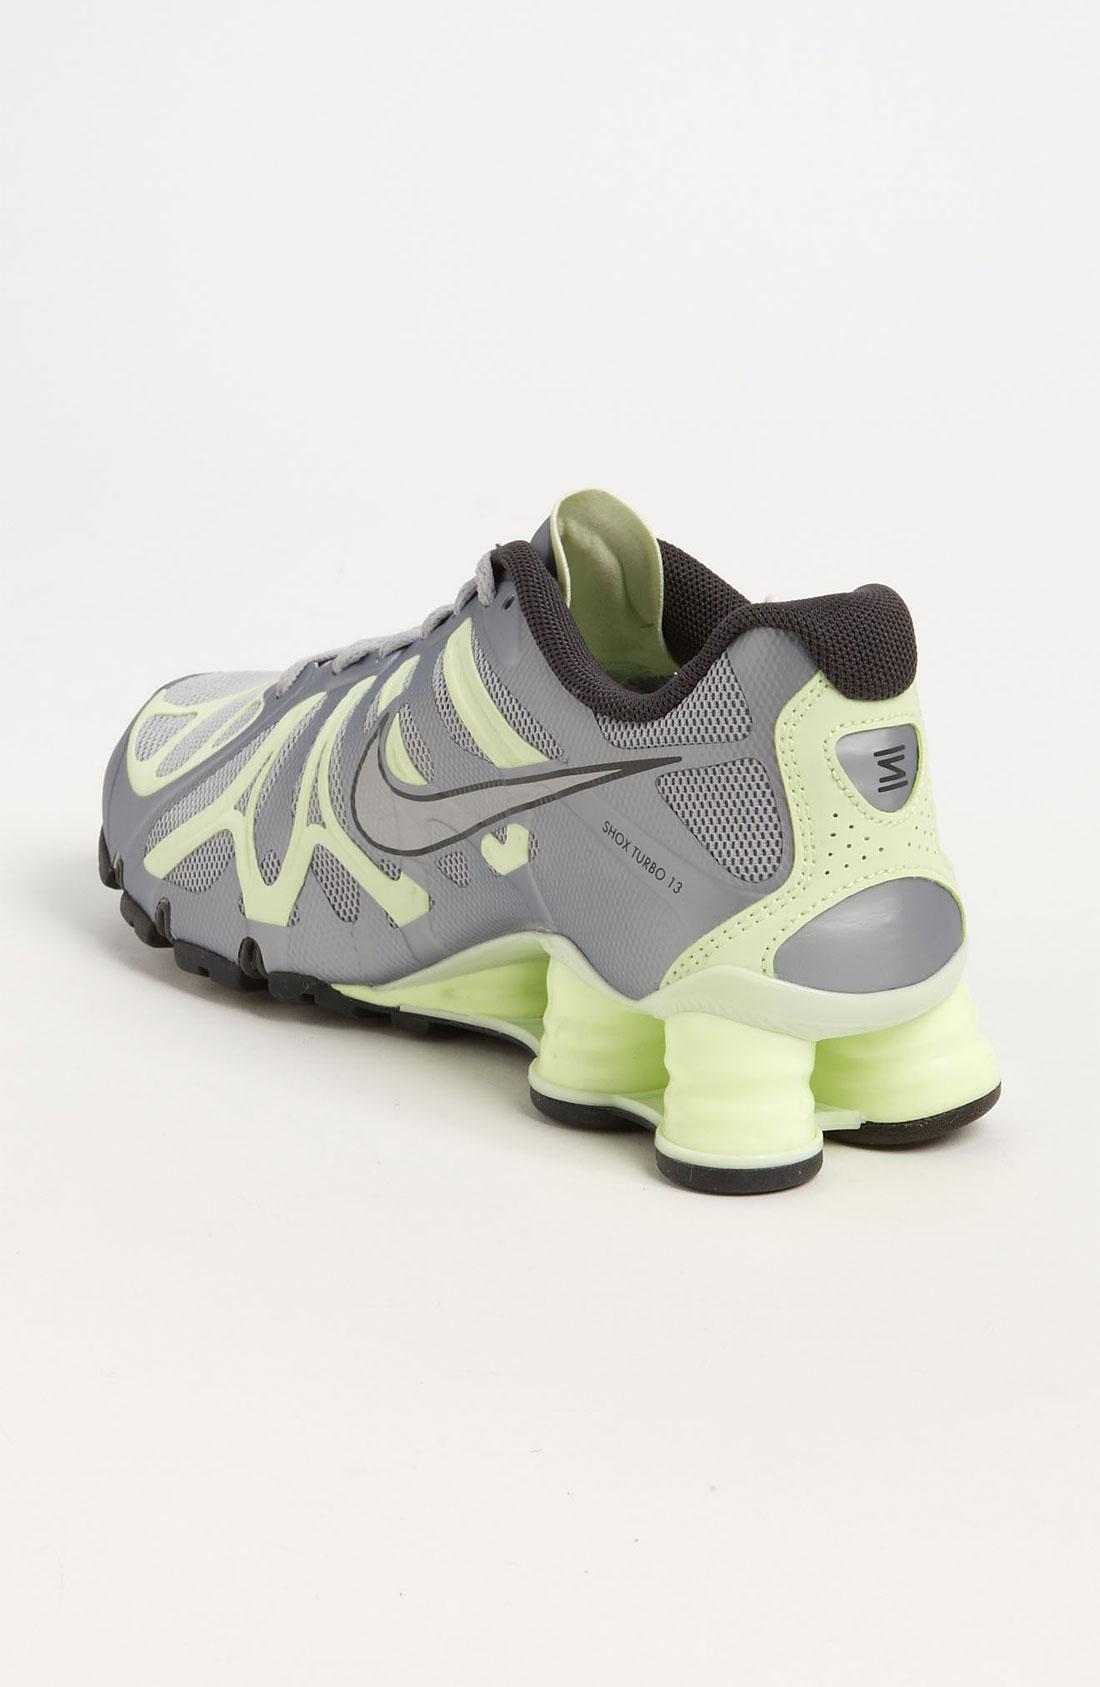 Nike Shox Turbo 13 Cool Grey Volt